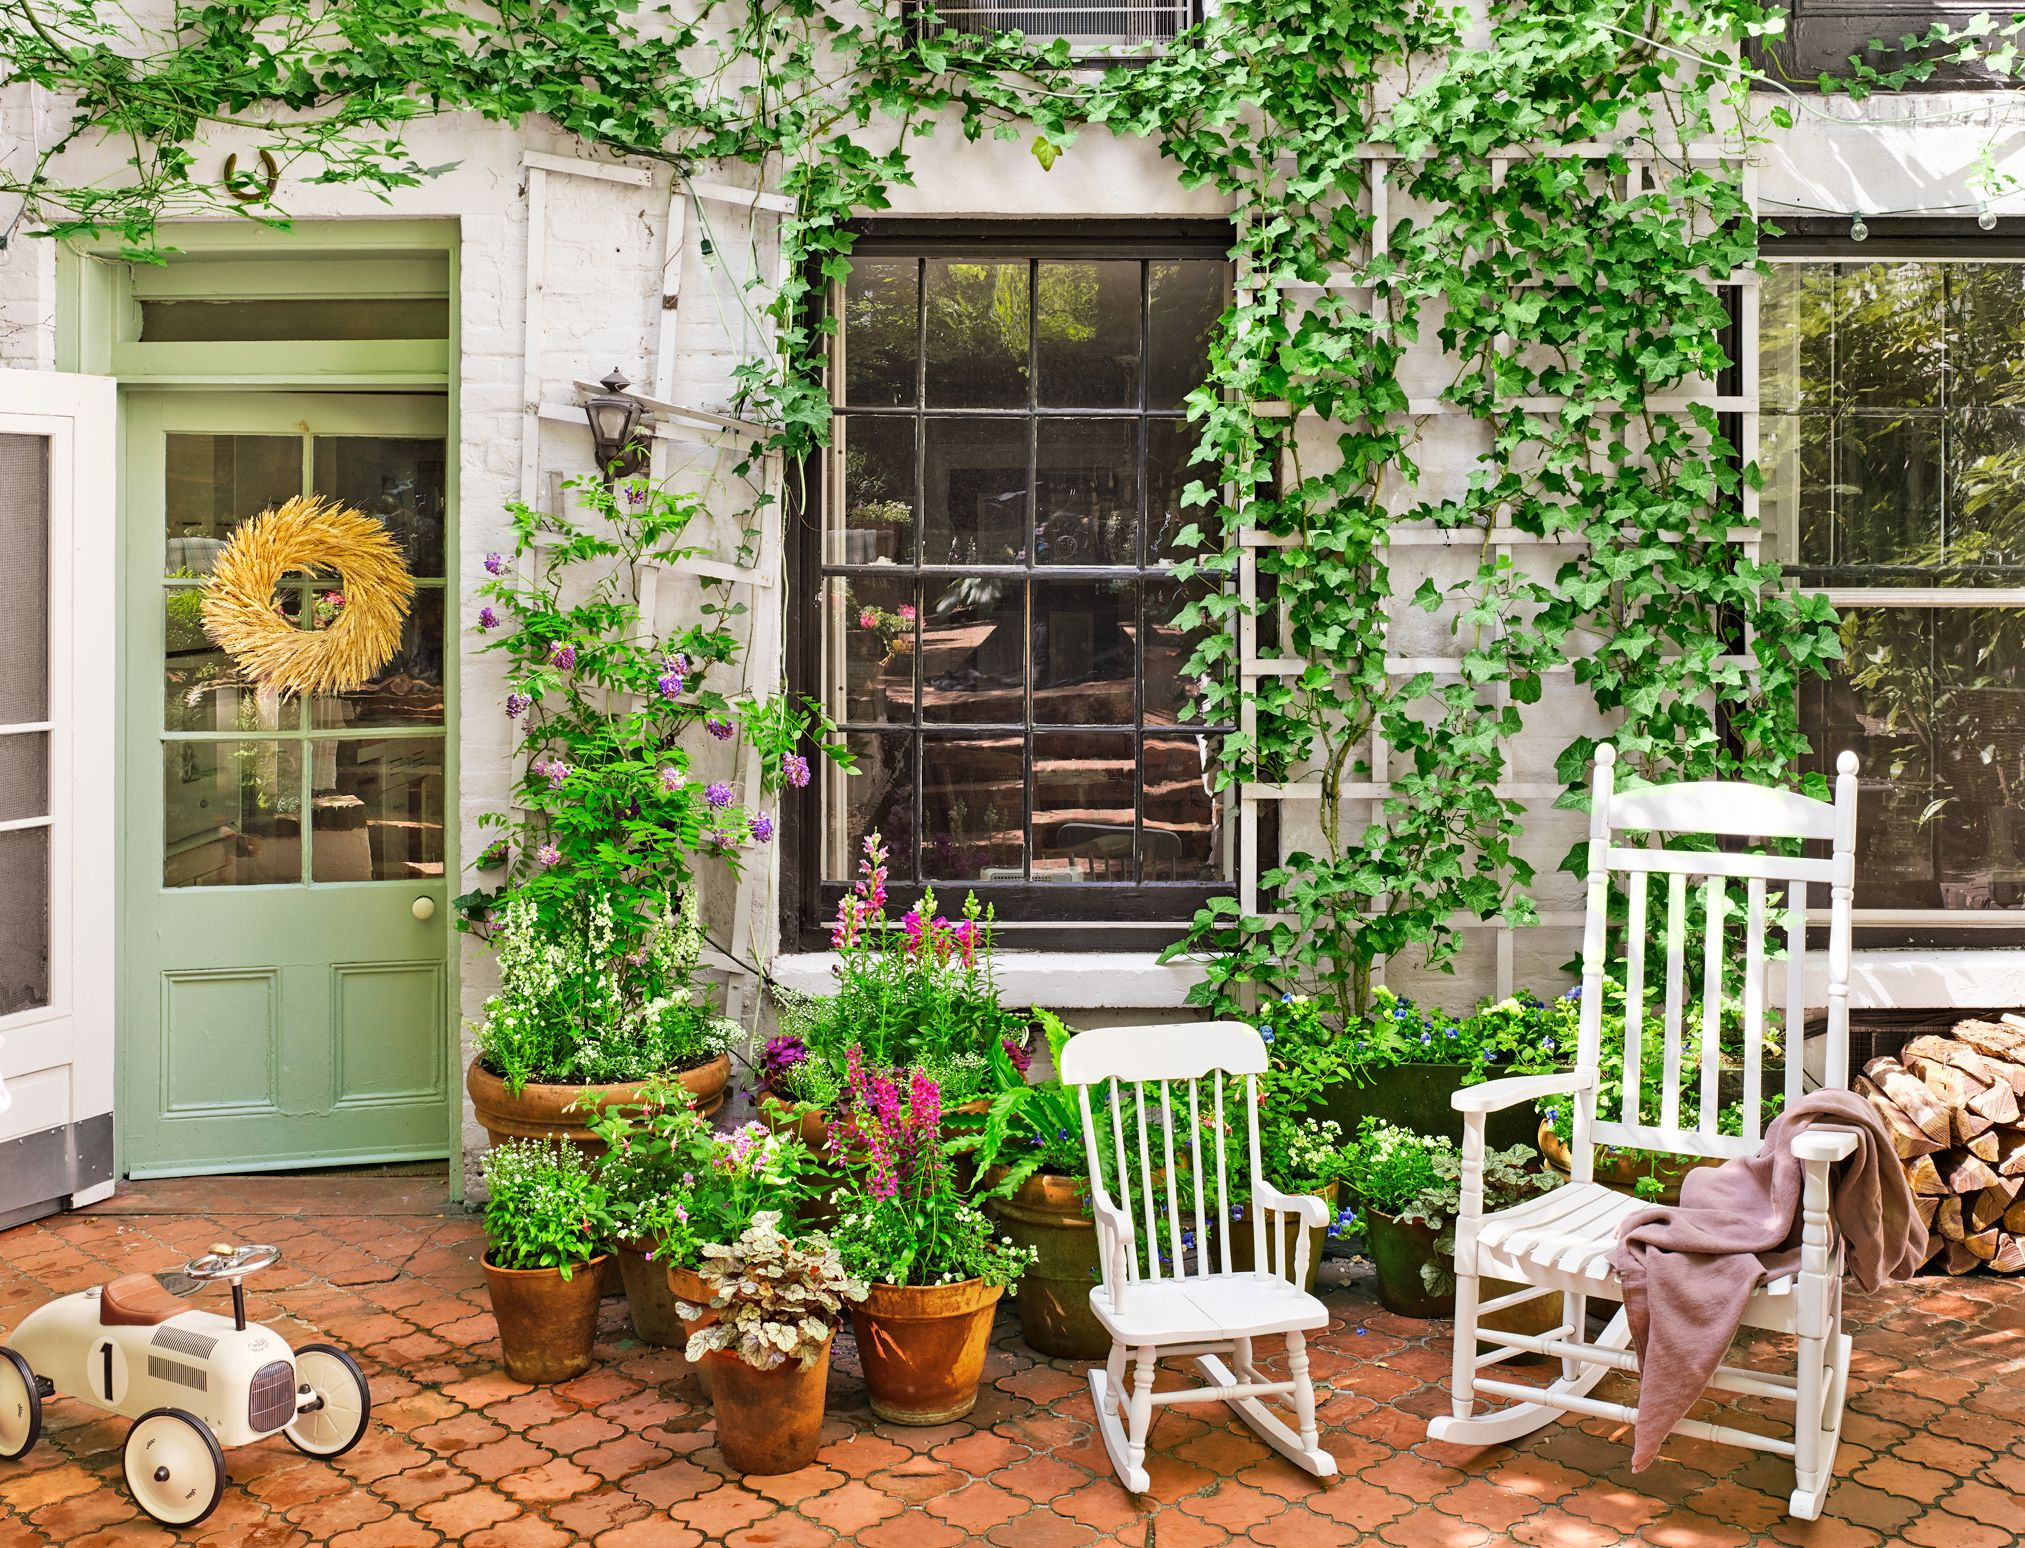 18 creative small garden ideas indoor